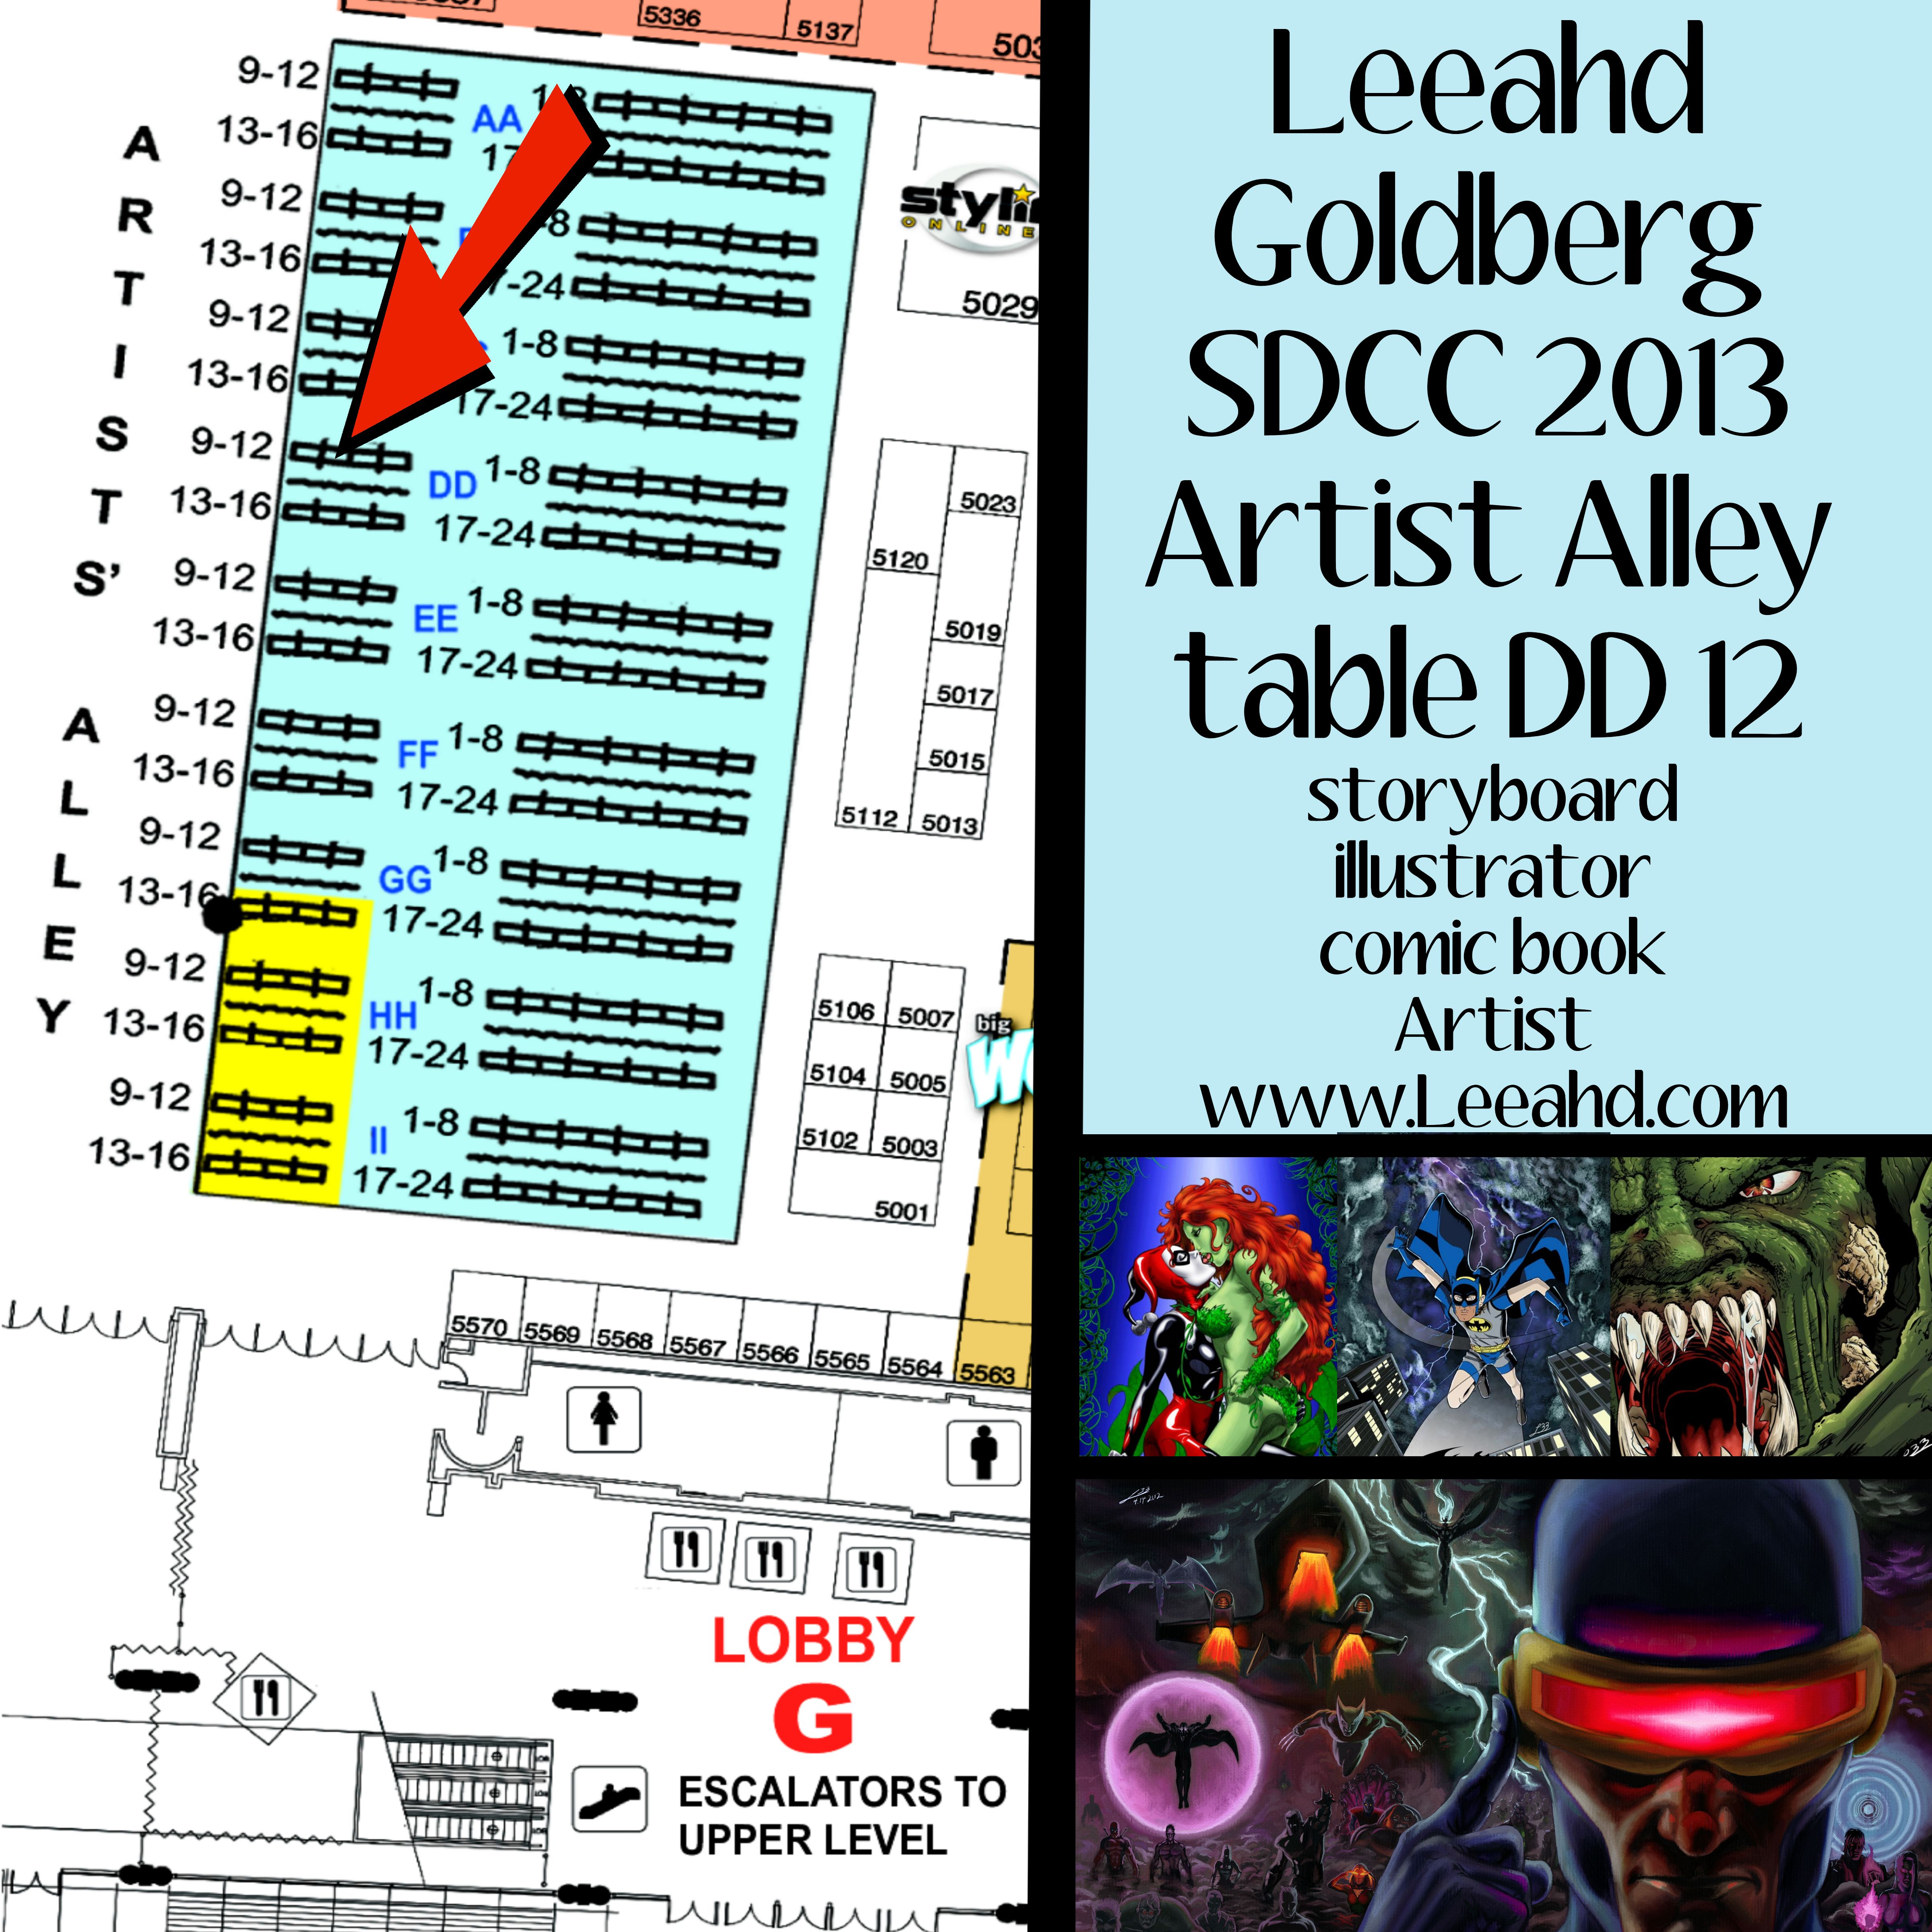 LeeahdComicCon2013 by Leeahd